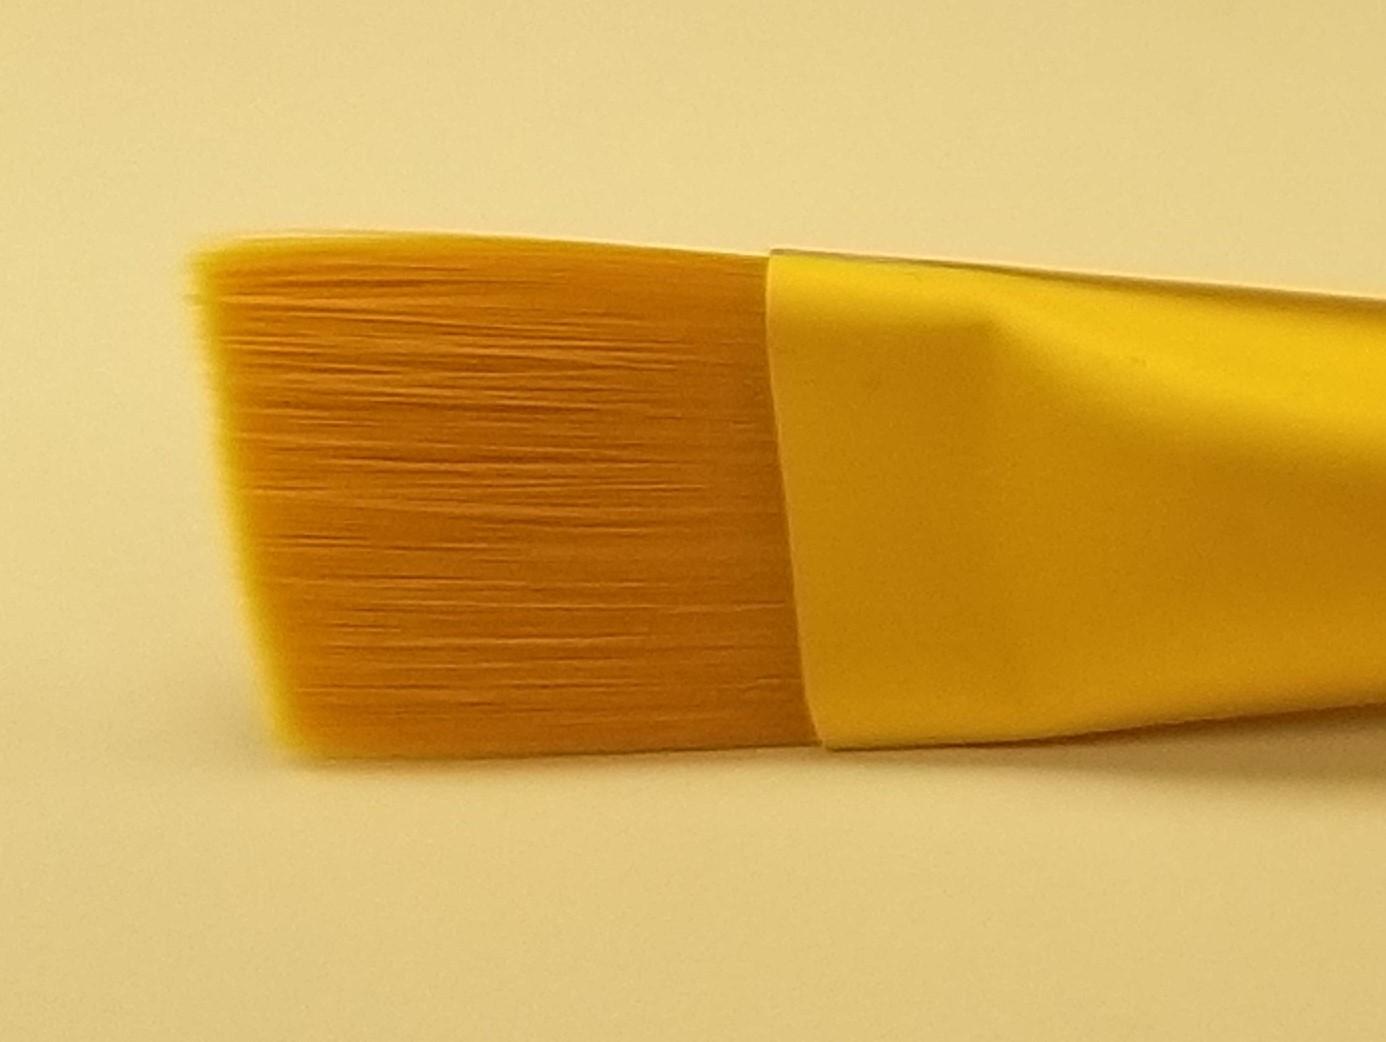 Large Square Flat Brush (Soft-grip)